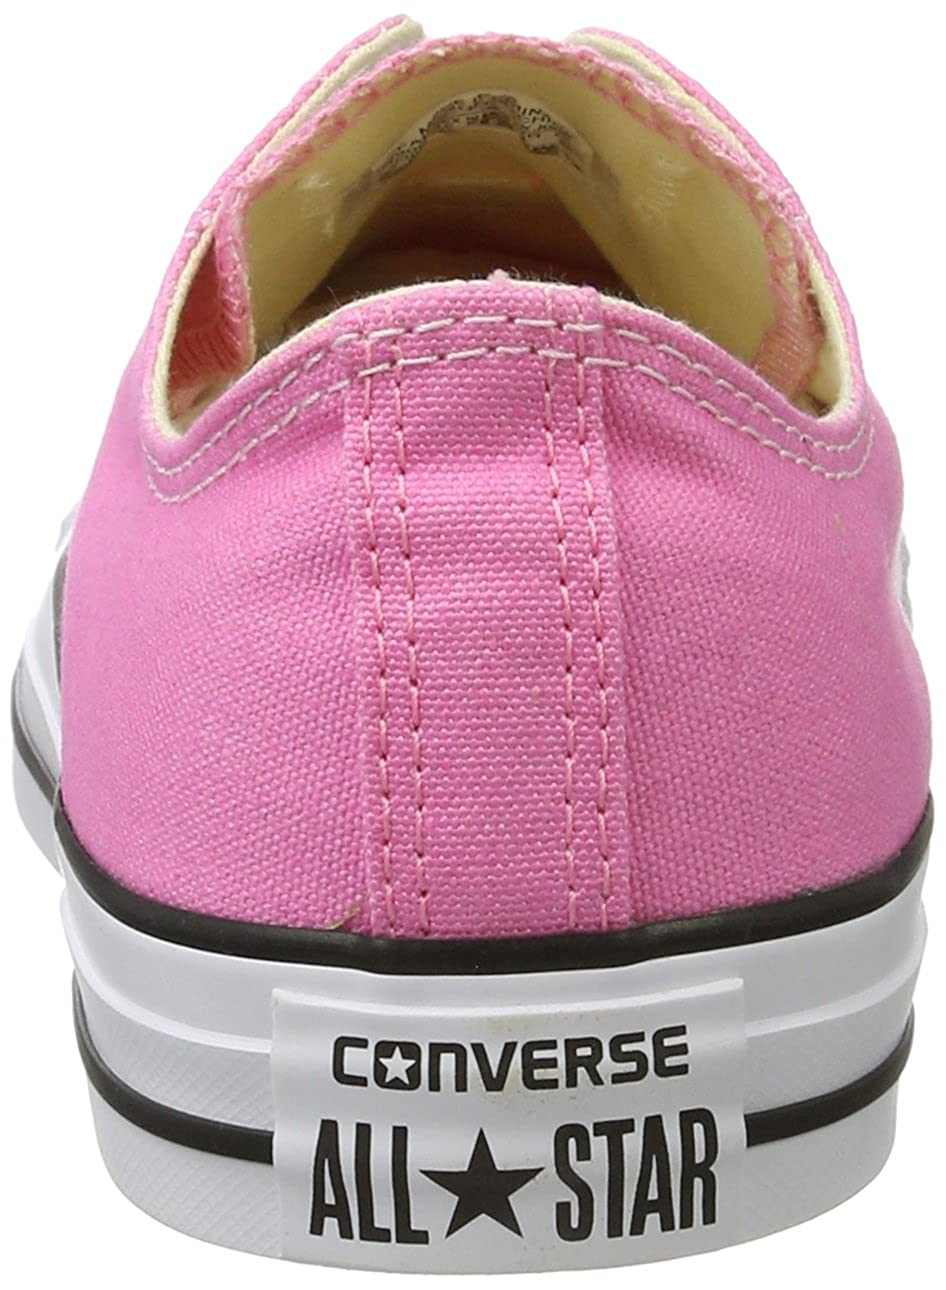 d074bf40b0b2ff Converse Men s Chuck Taylor All Star Seasonal Trainers  Amazon.co.uk  Shoes    Bags